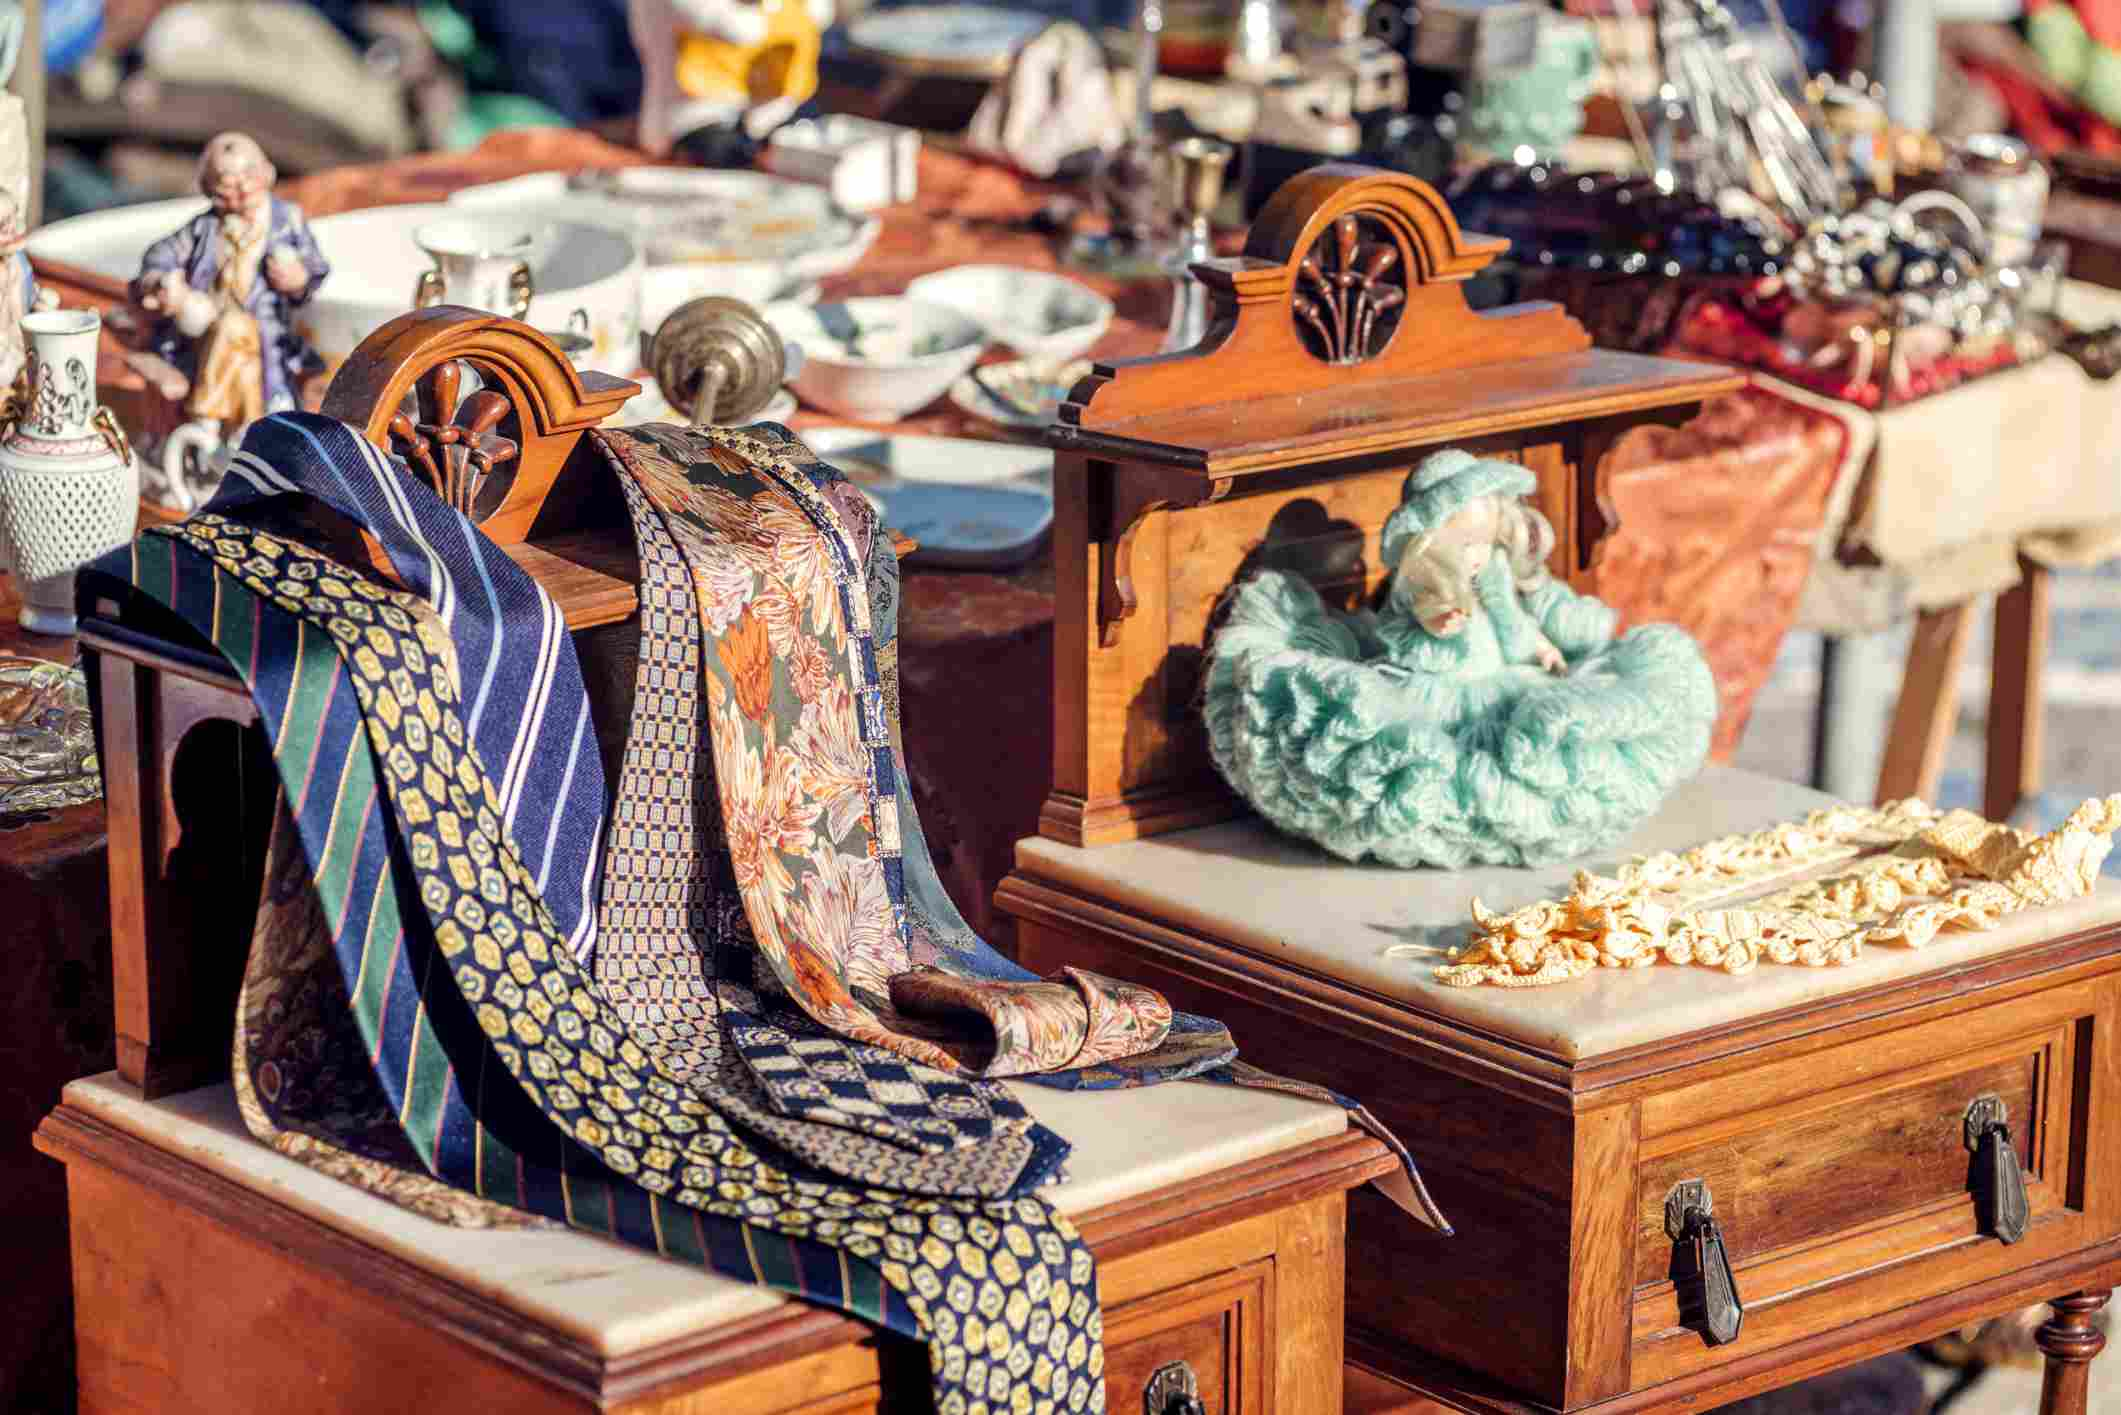 Antique furniture and knickknacks at flea market